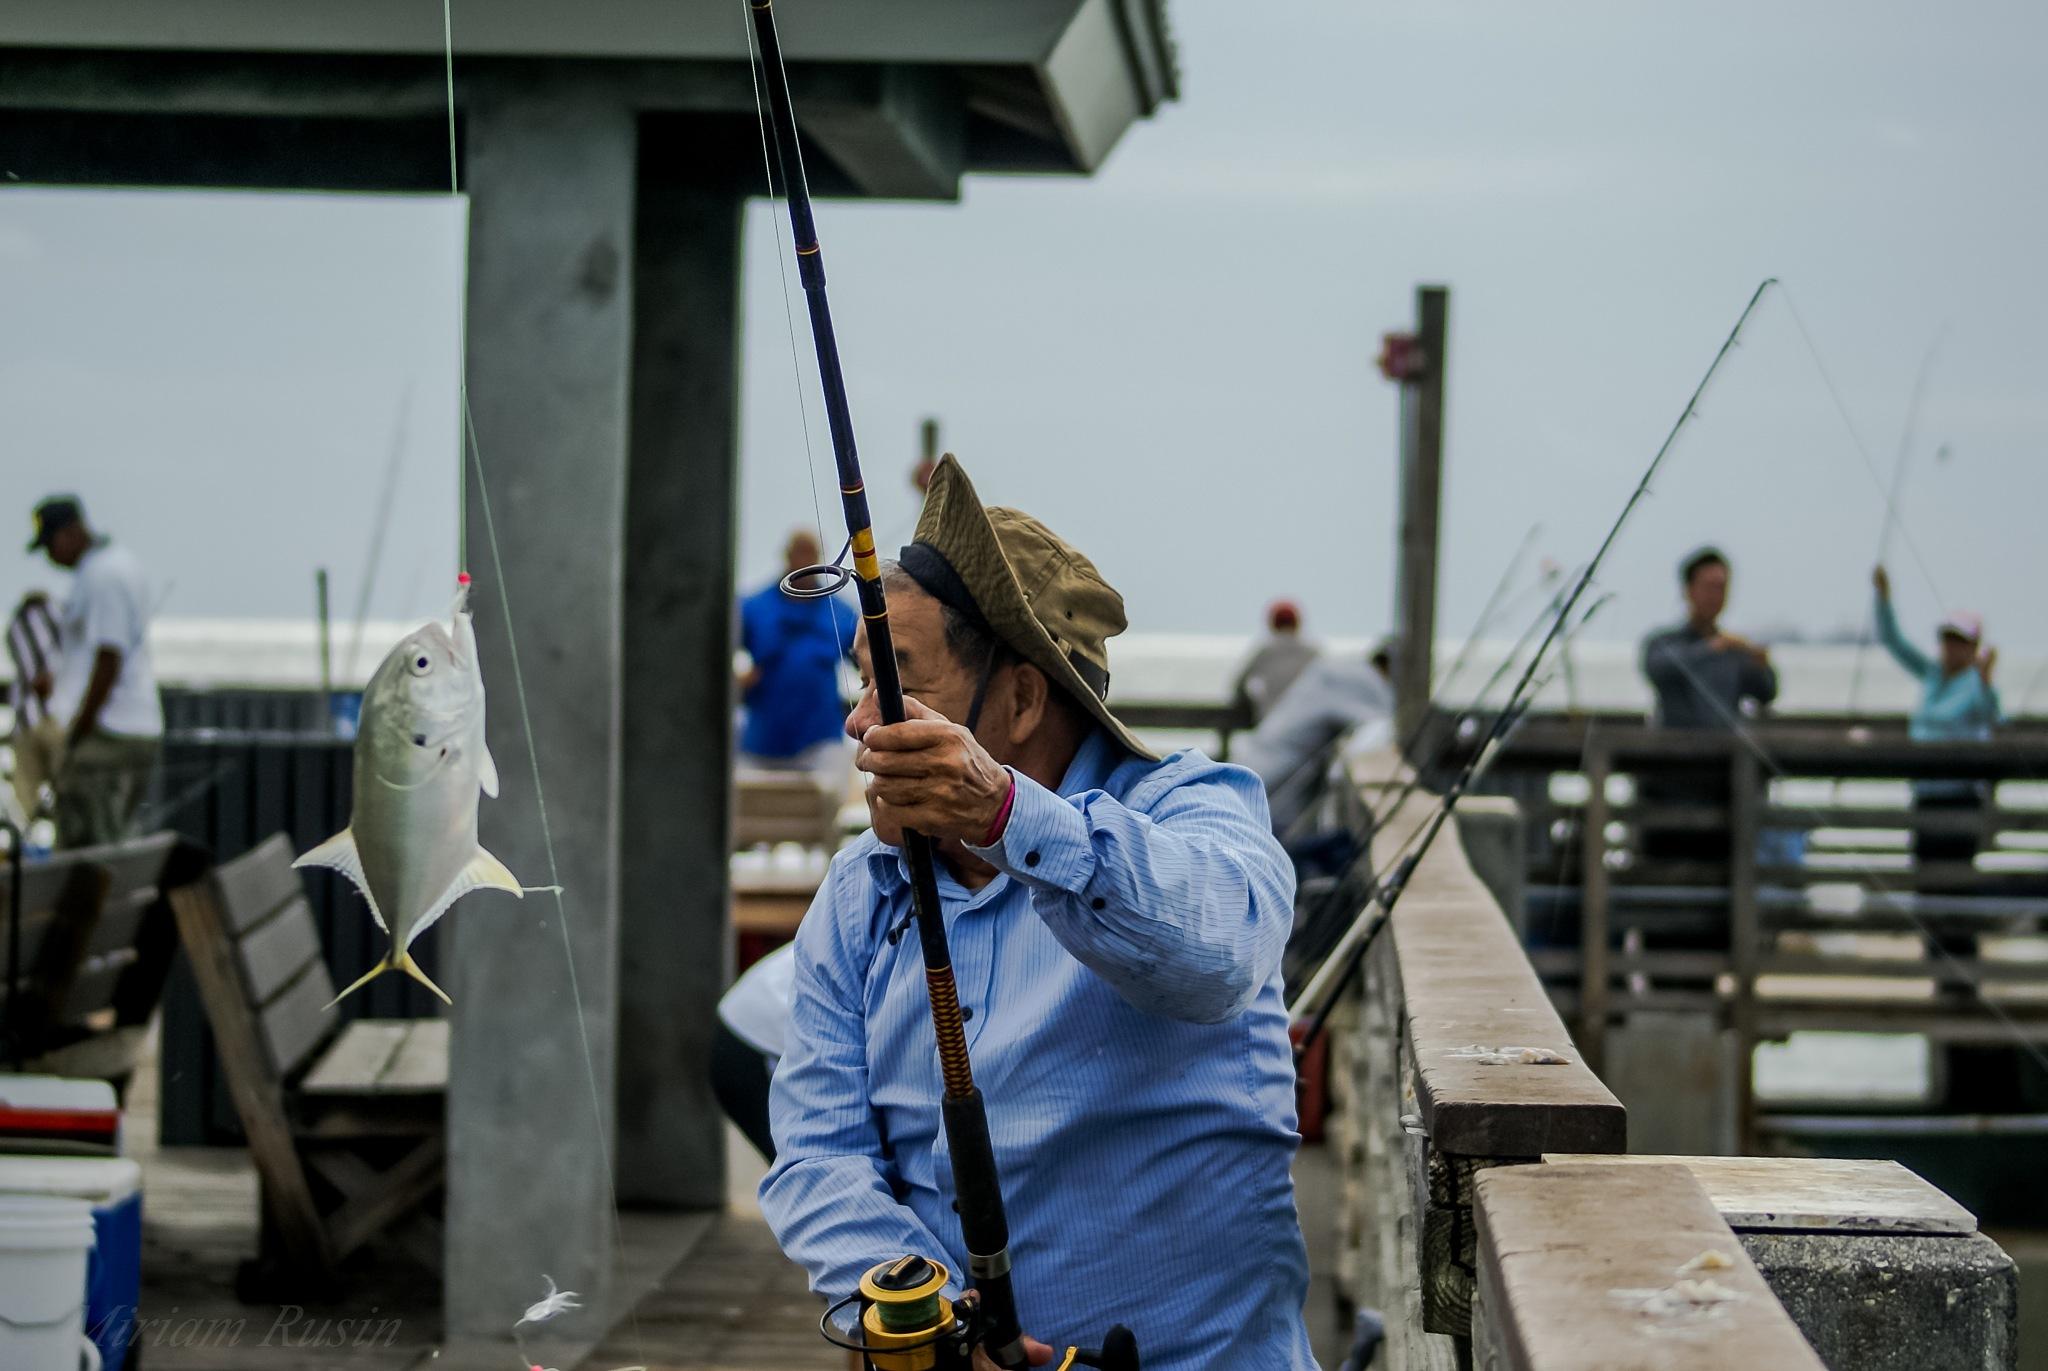 Happy catch the fish by miriamrusin